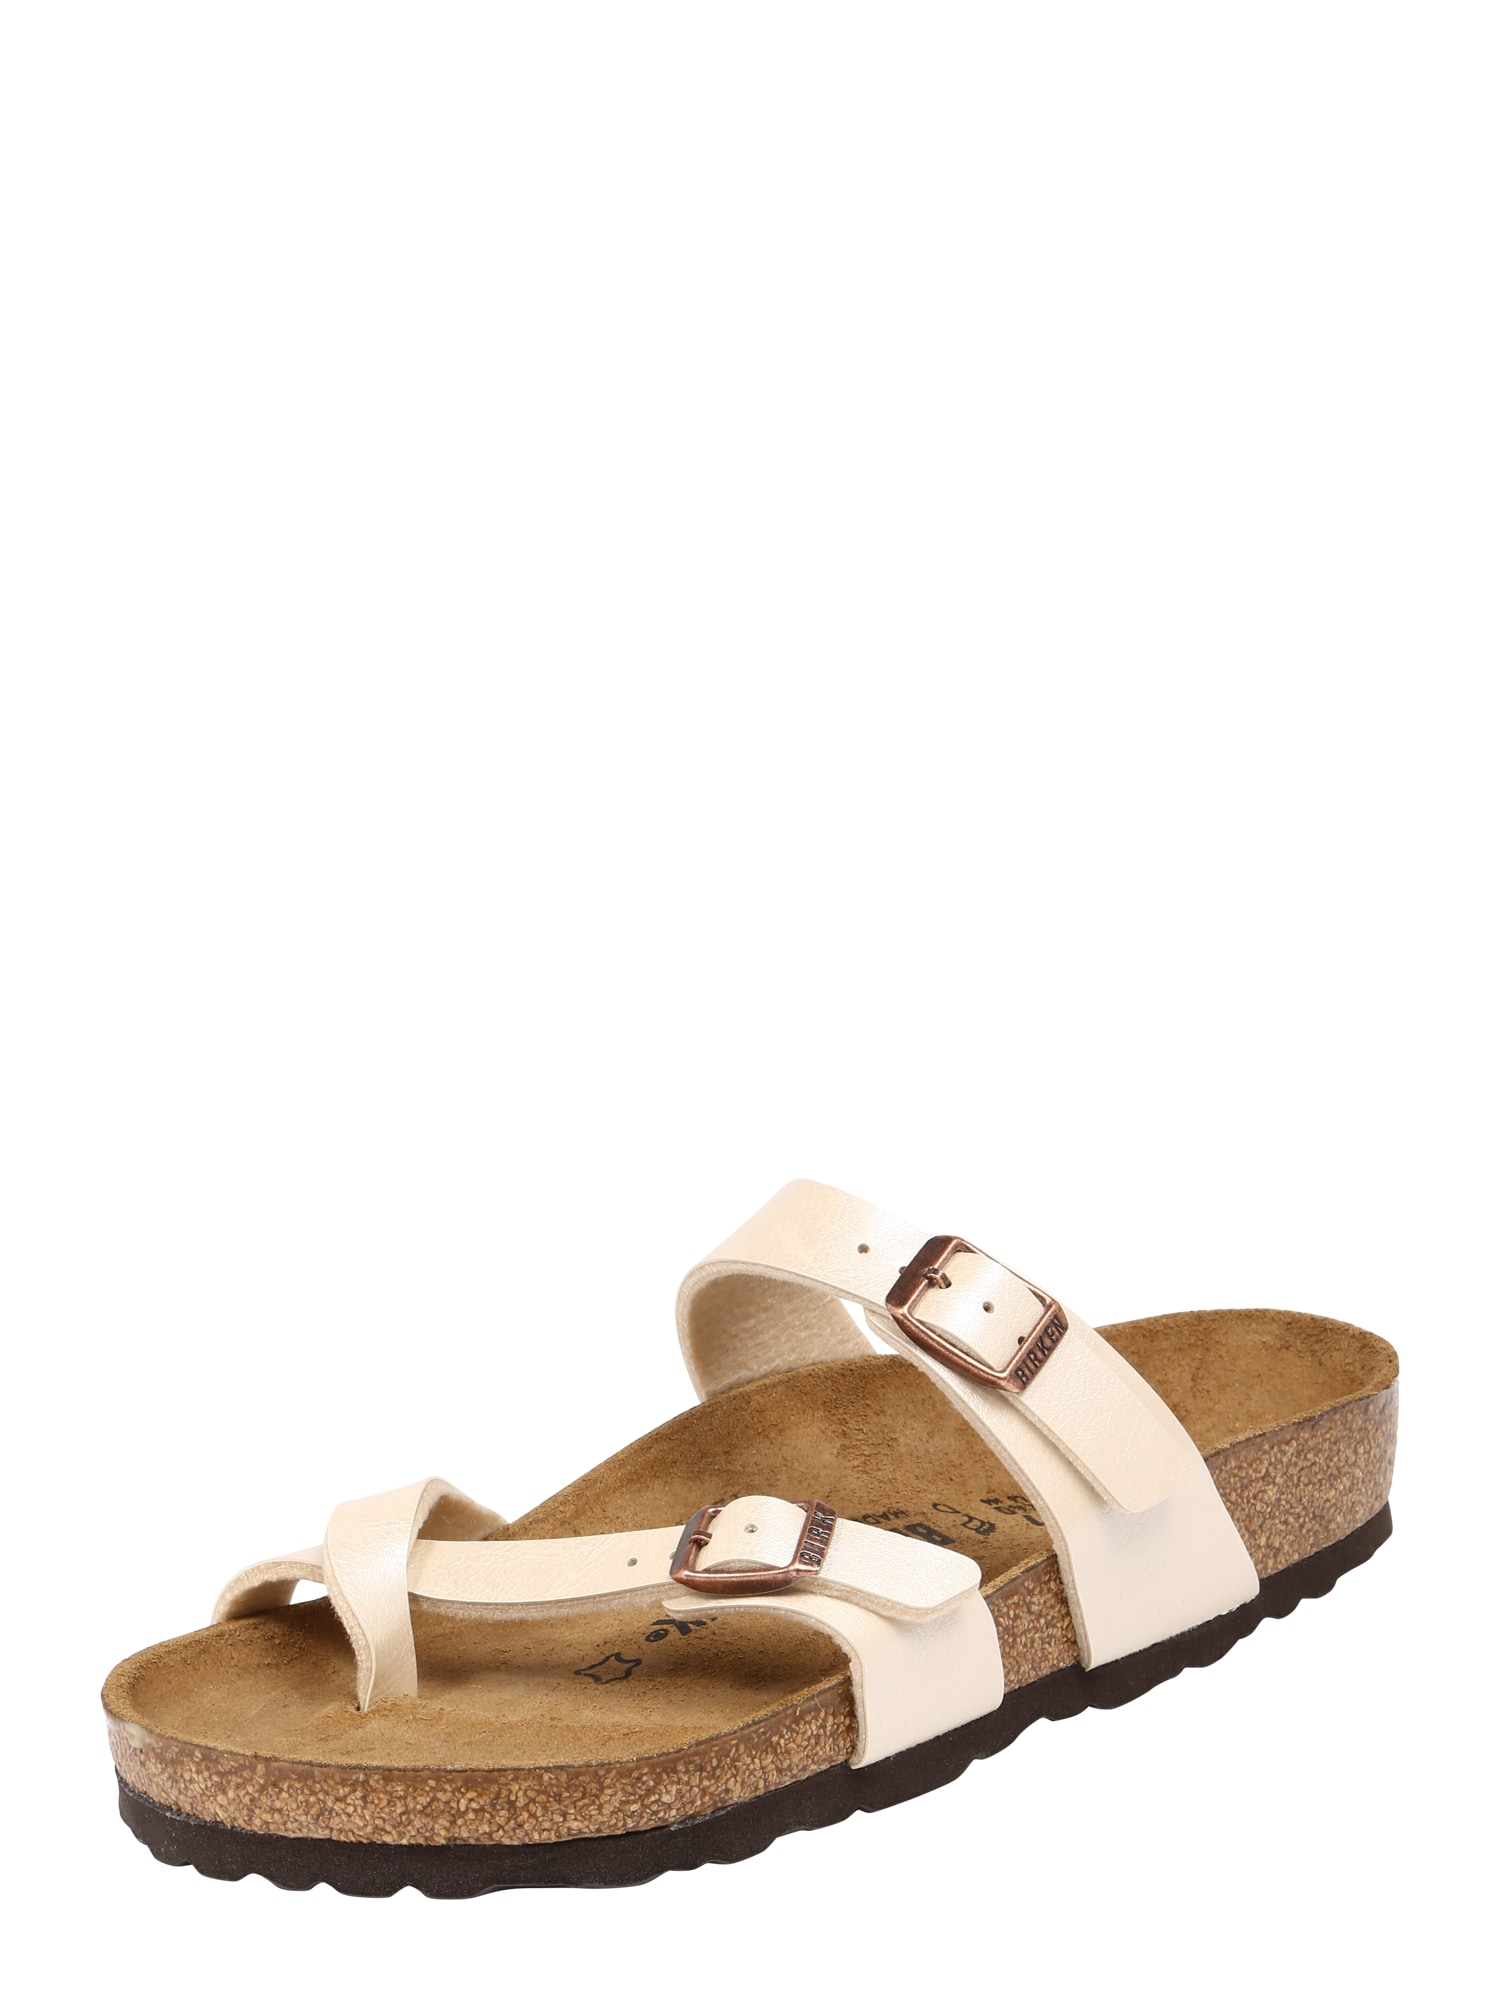 Pantofle Mayari béžová hnědá BIRKENSTOCK